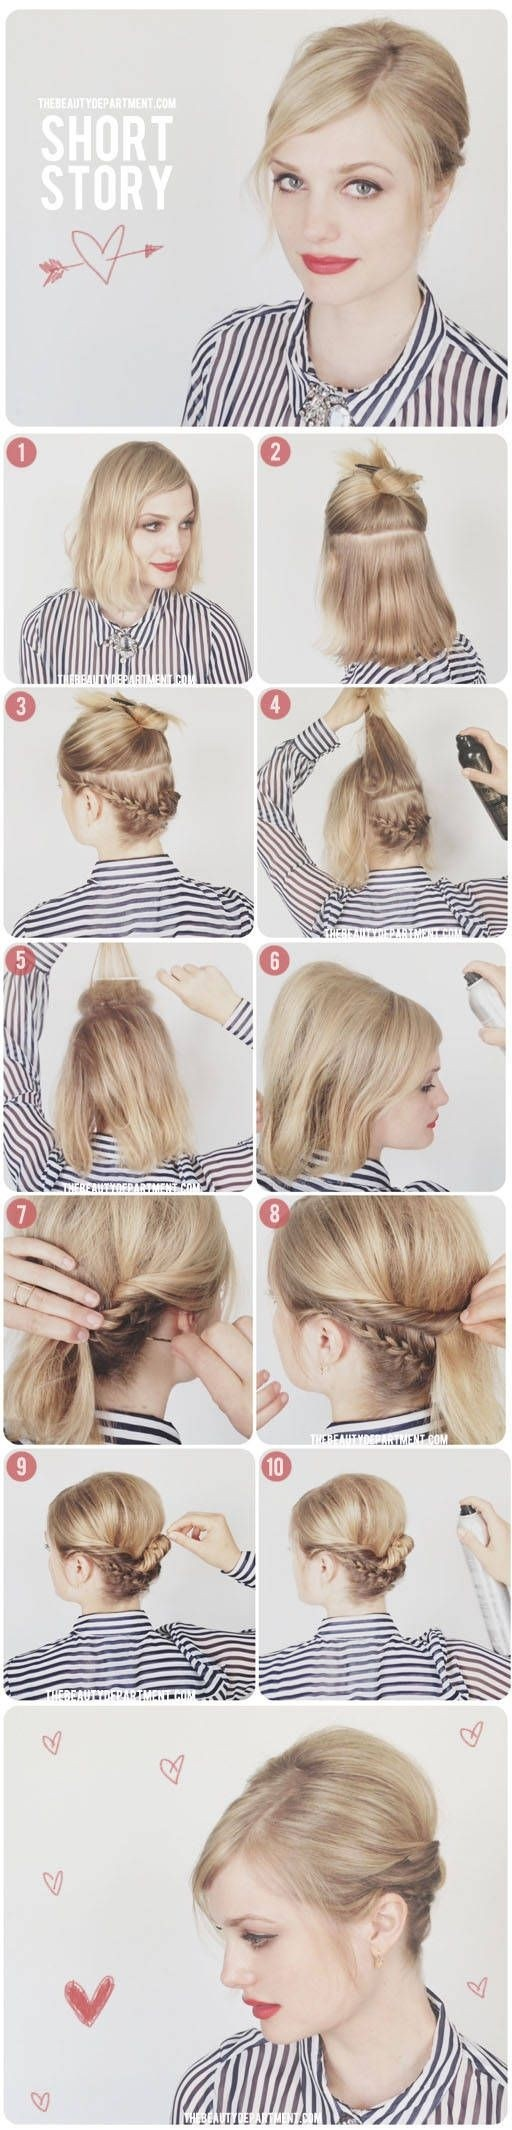 8 Cute Updo Hairstyles For Short Hair Popular Haircuts